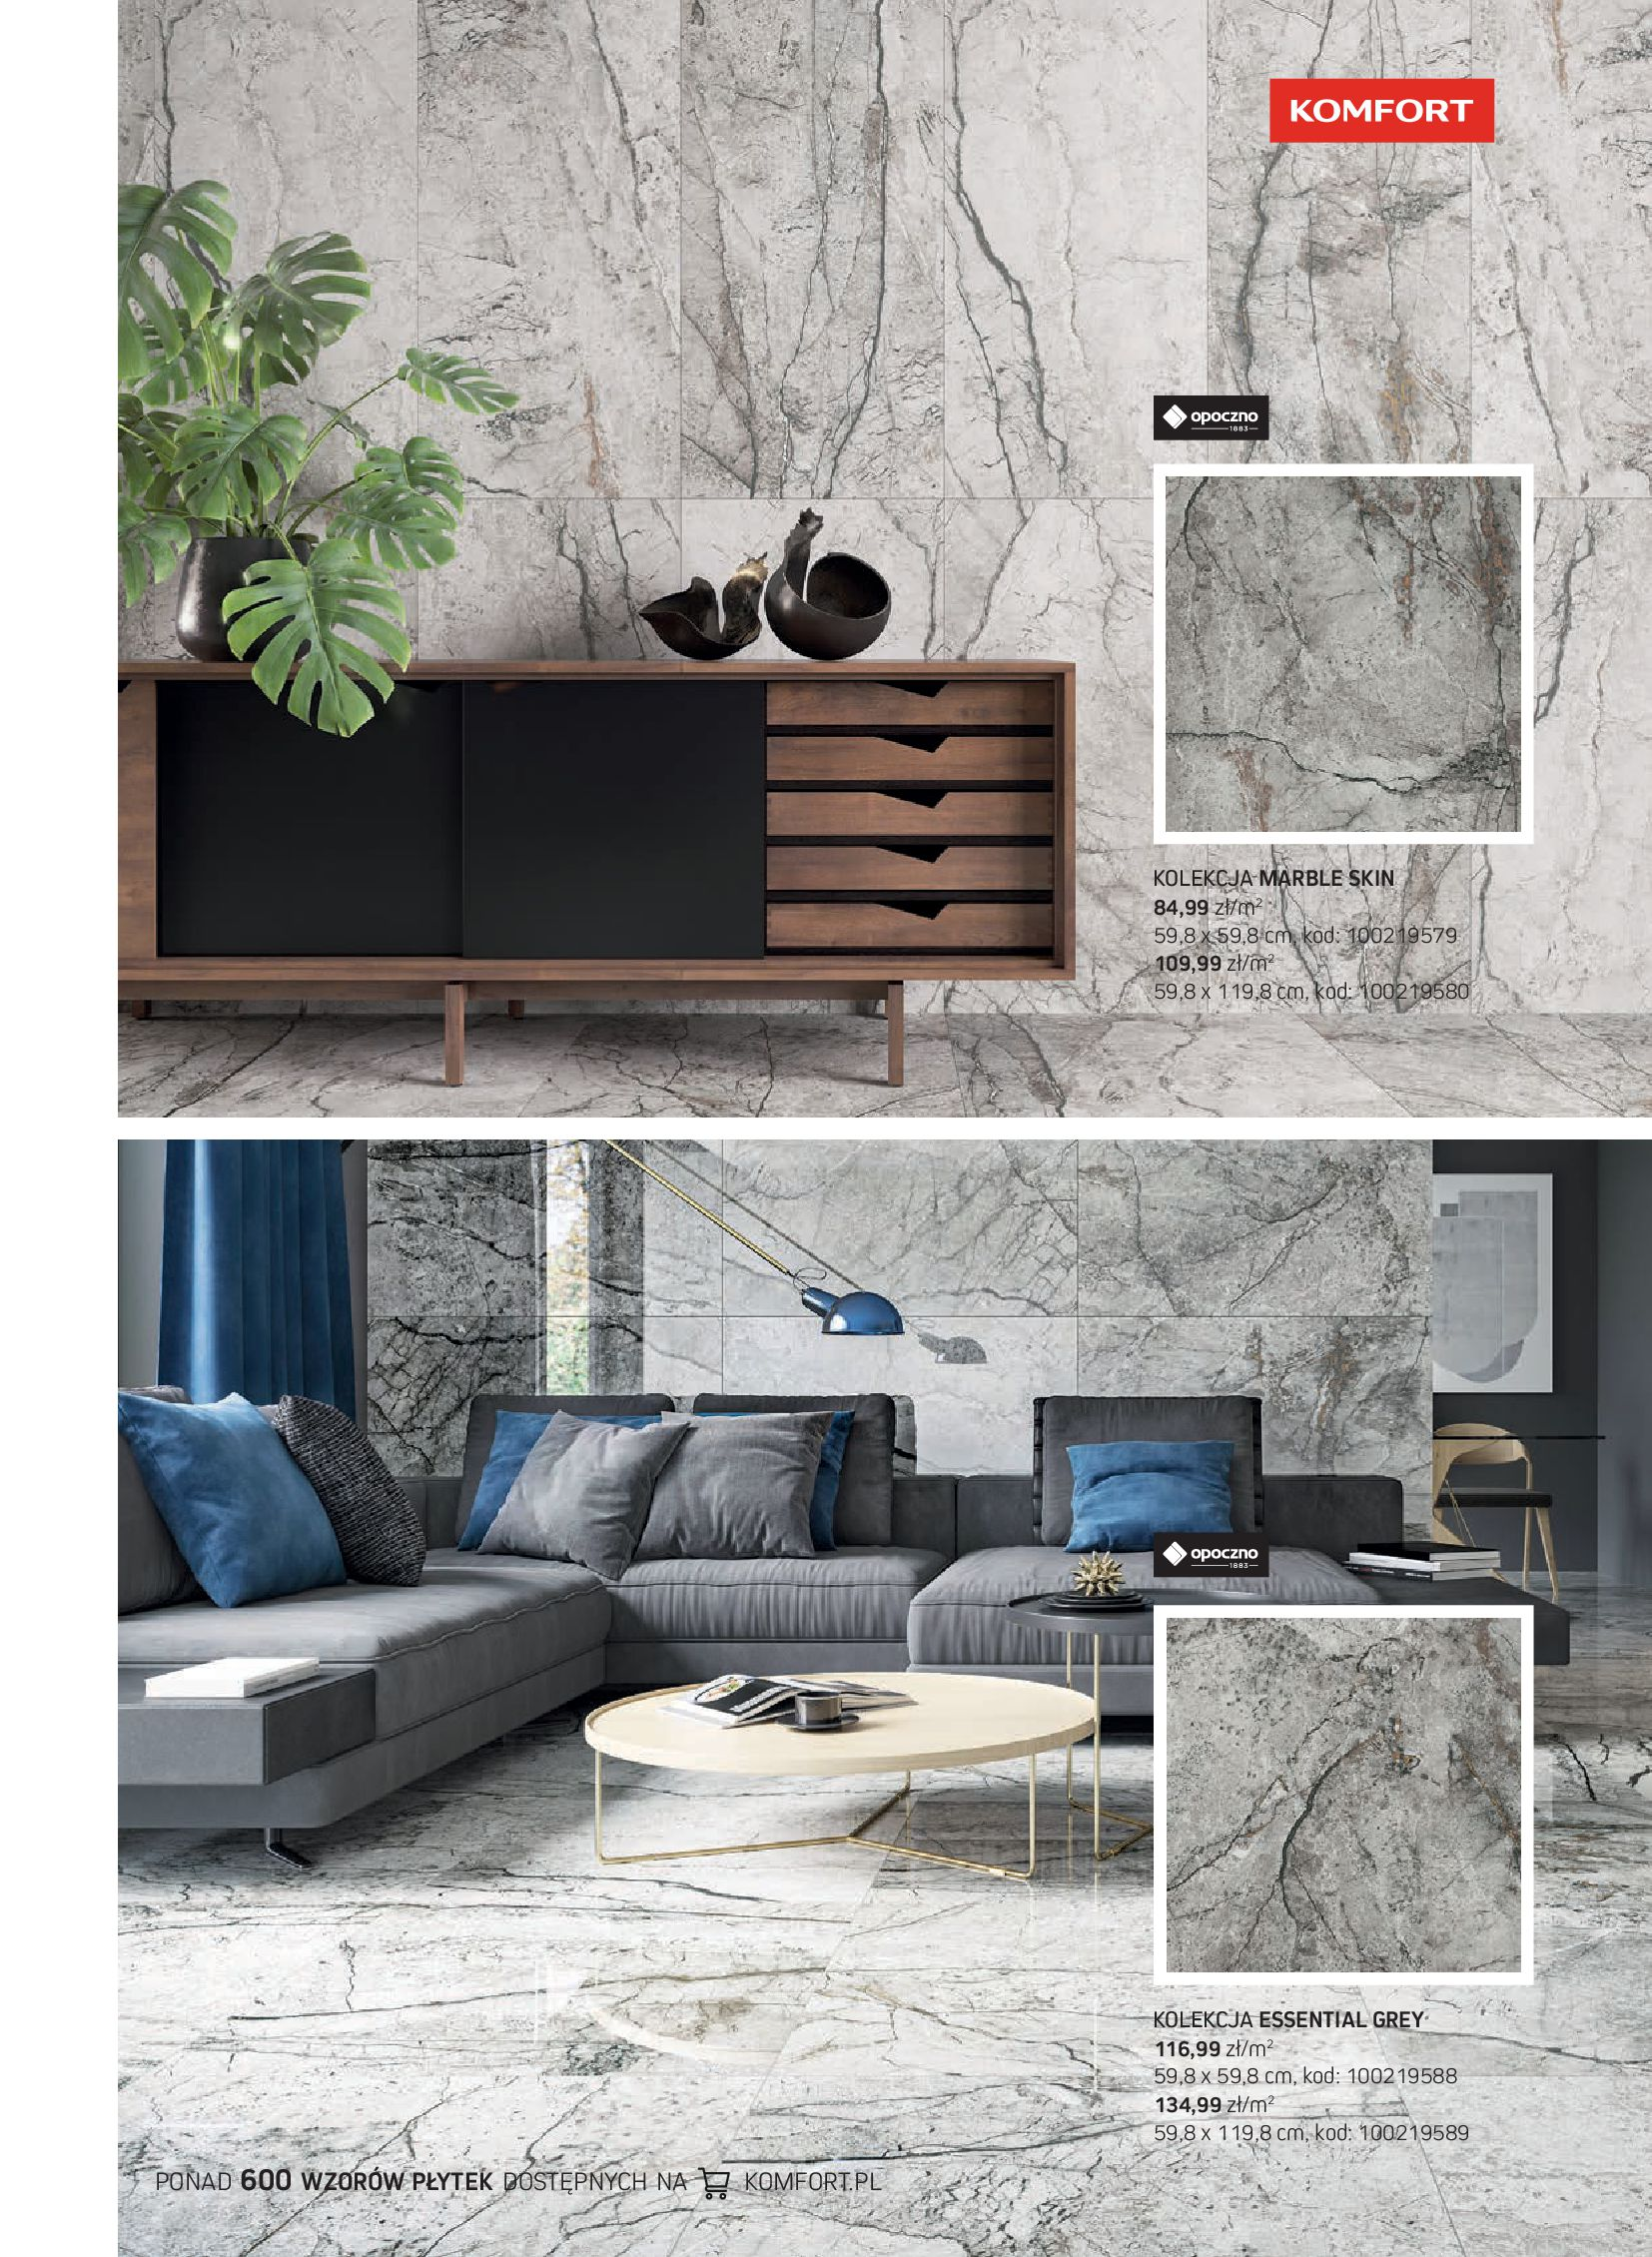 Gazetka Komfort: Gazetka Komfort - Katalog podłogi i drzwi 2021-06-16 page-49